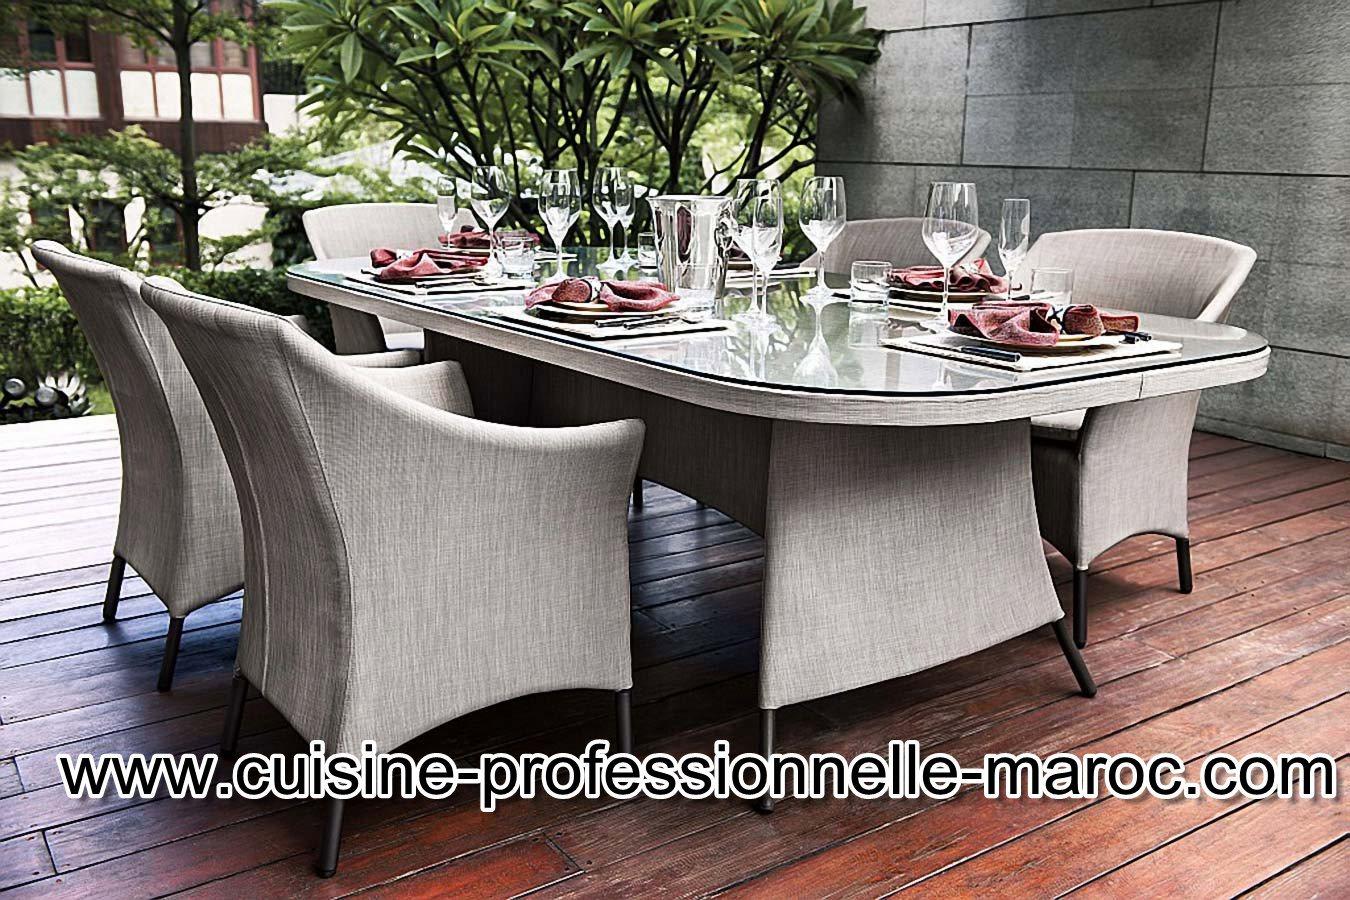 equipement caf restaurants ou h tel au maroc les. Black Bedroom Furniture Sets. Home Design Ideas